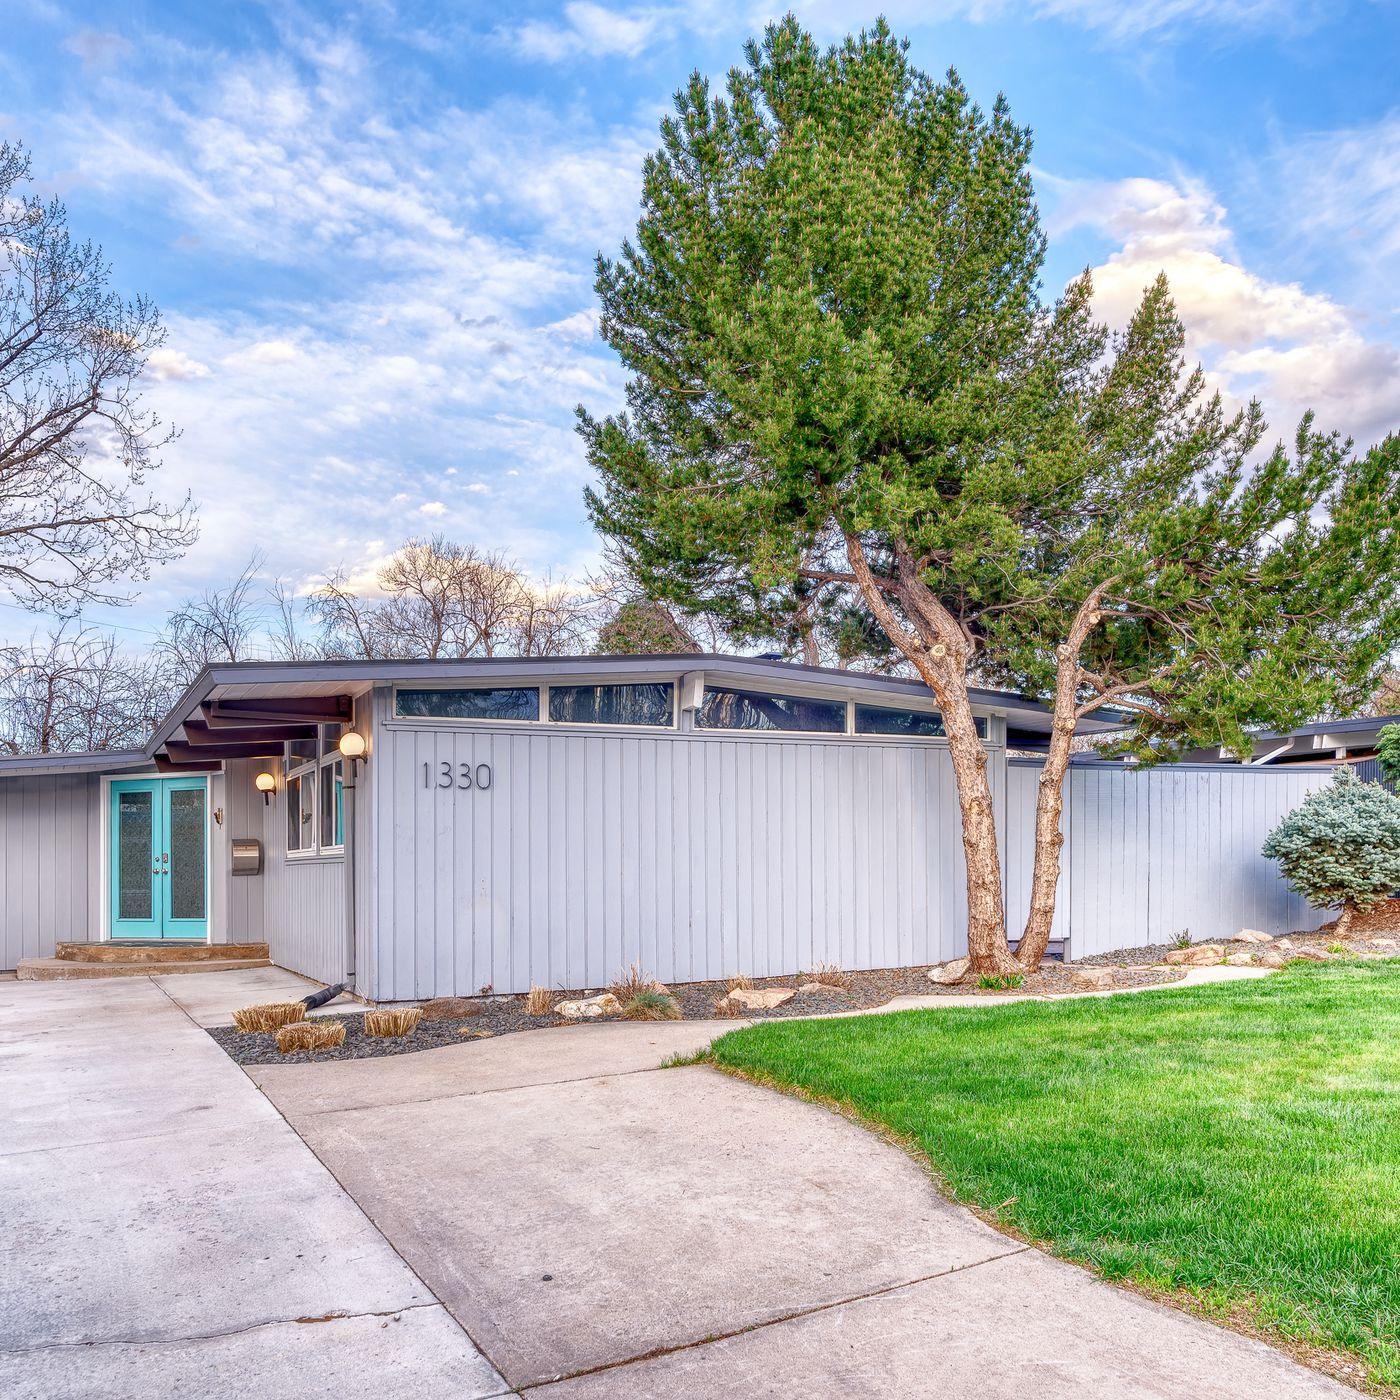 Lovely midcentury modern wants $689K in Denver - Curbed